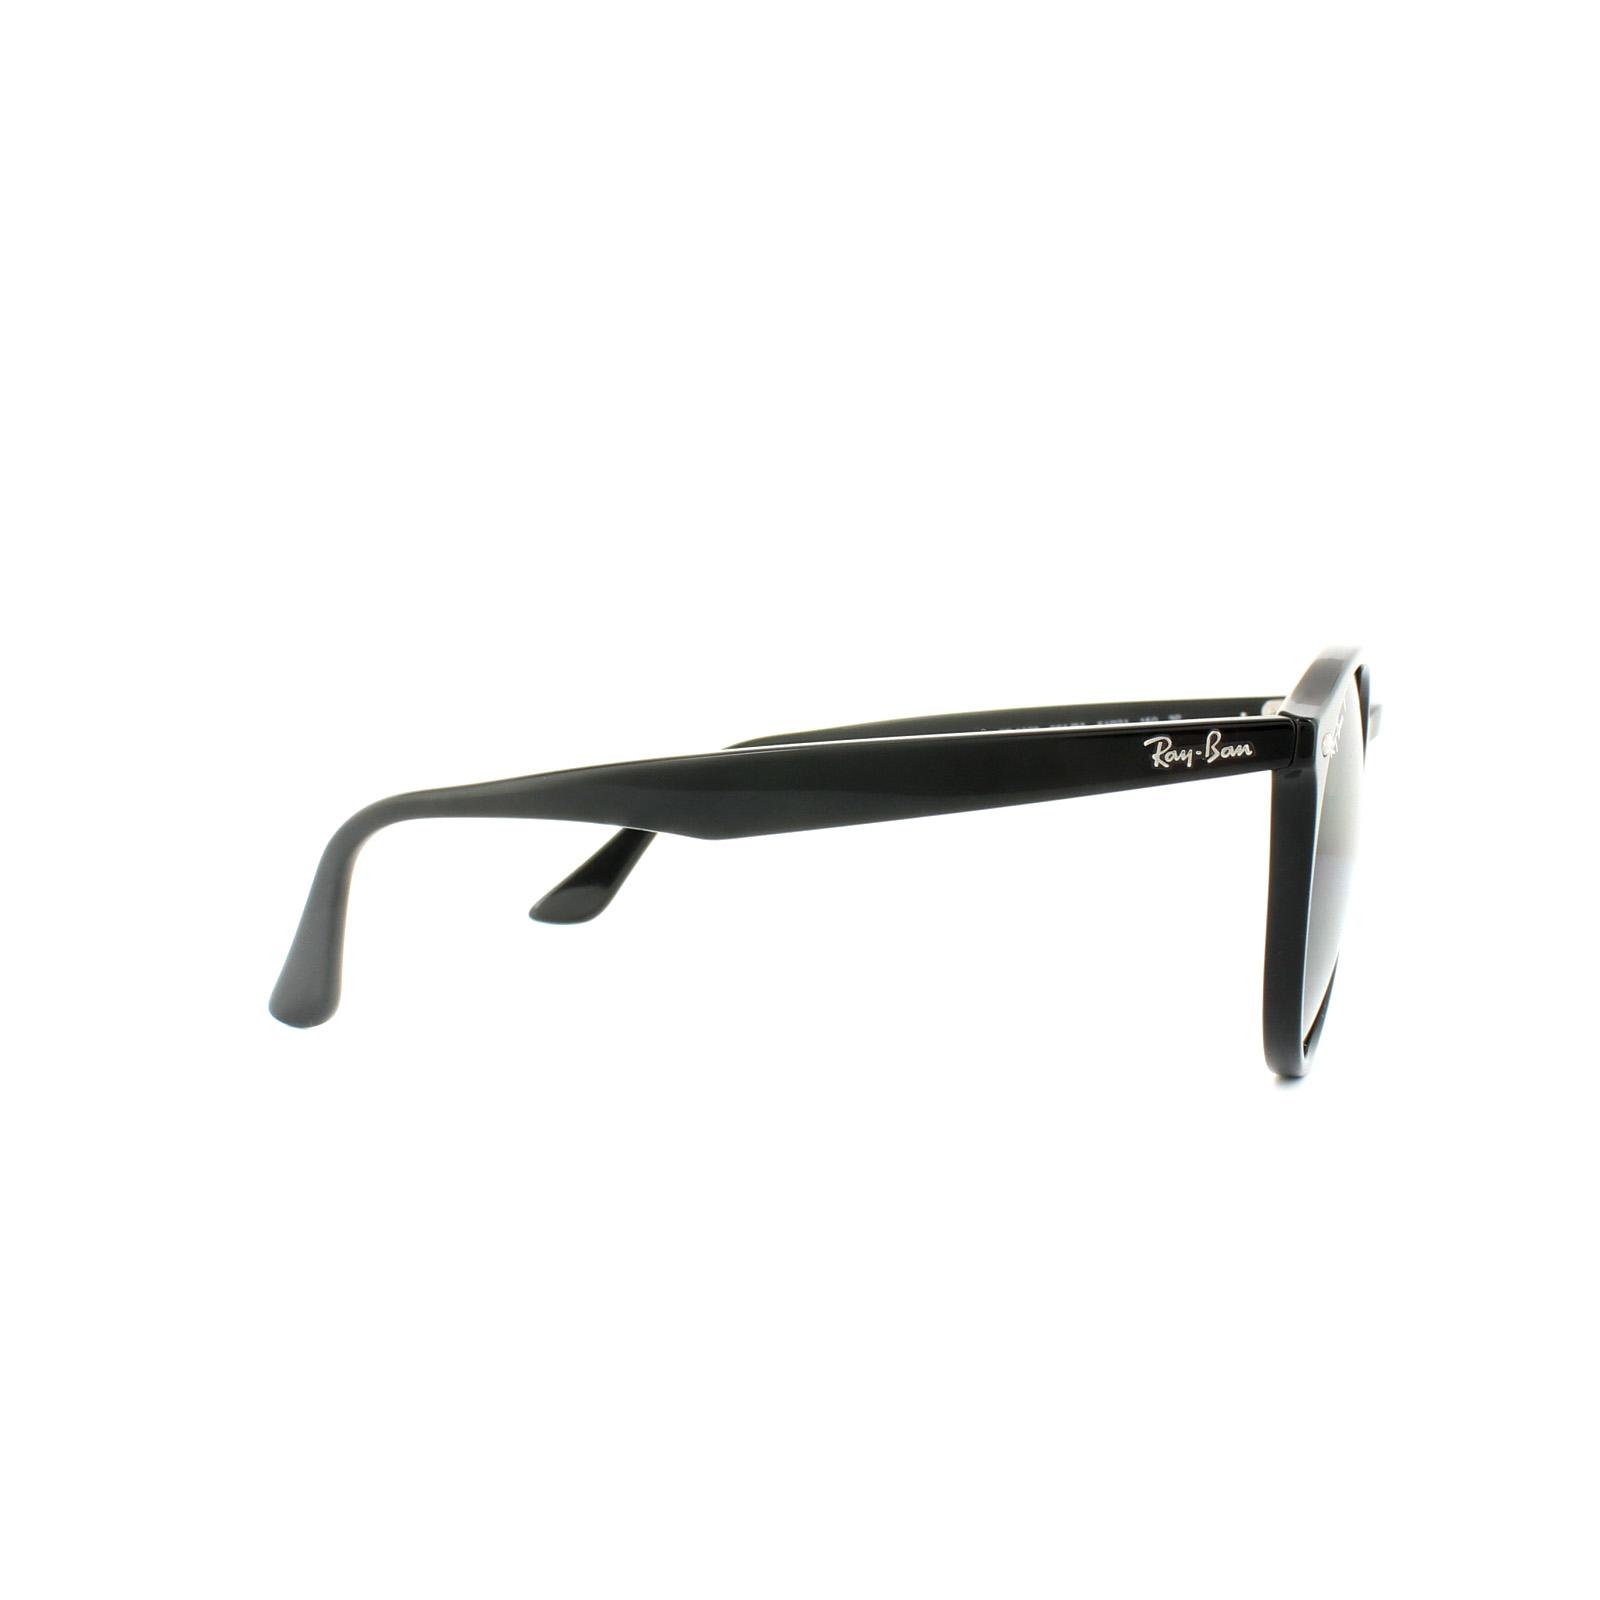 714cff21fb Ray-Ban Sunglasses 4279 601 9A Black Green Polarized 8053672730586 ...